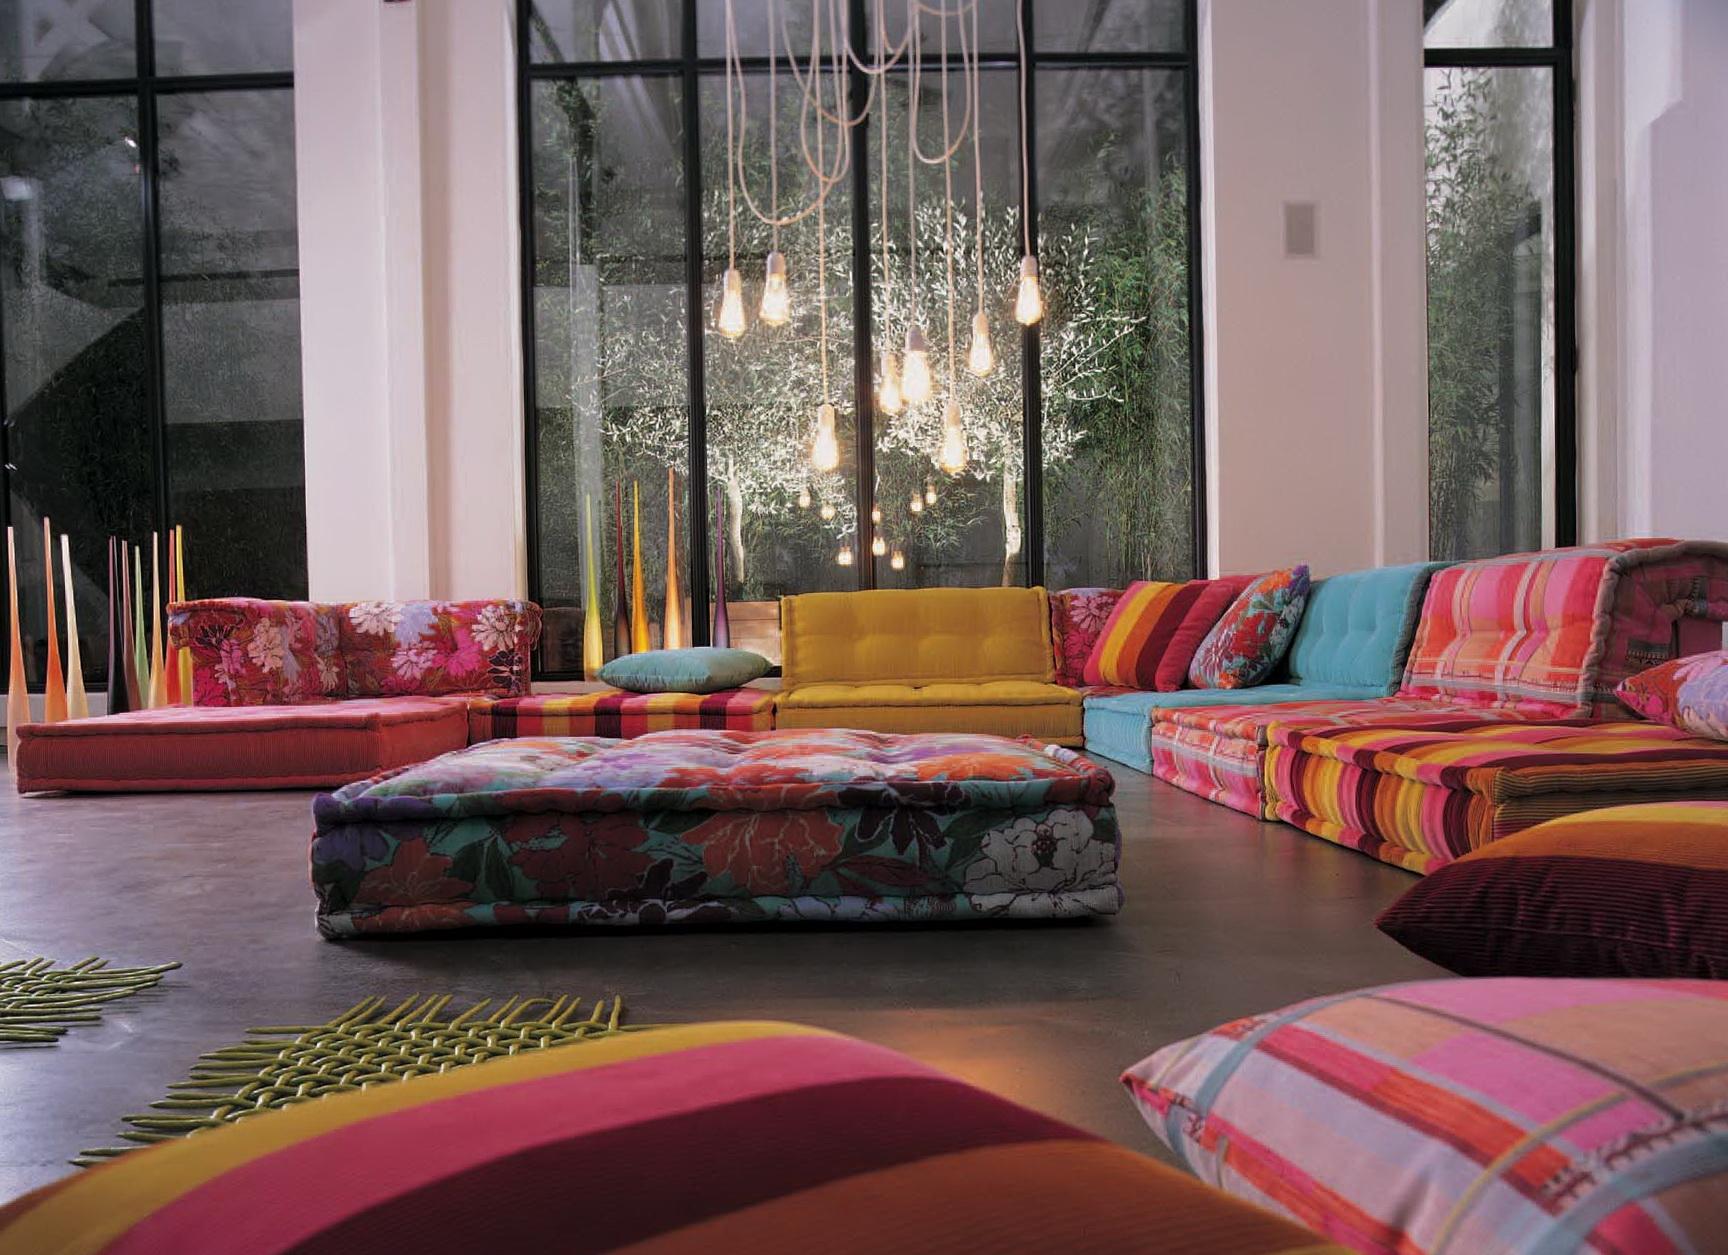 Top 15 Floor Seating Ideas  Sofa Ideas